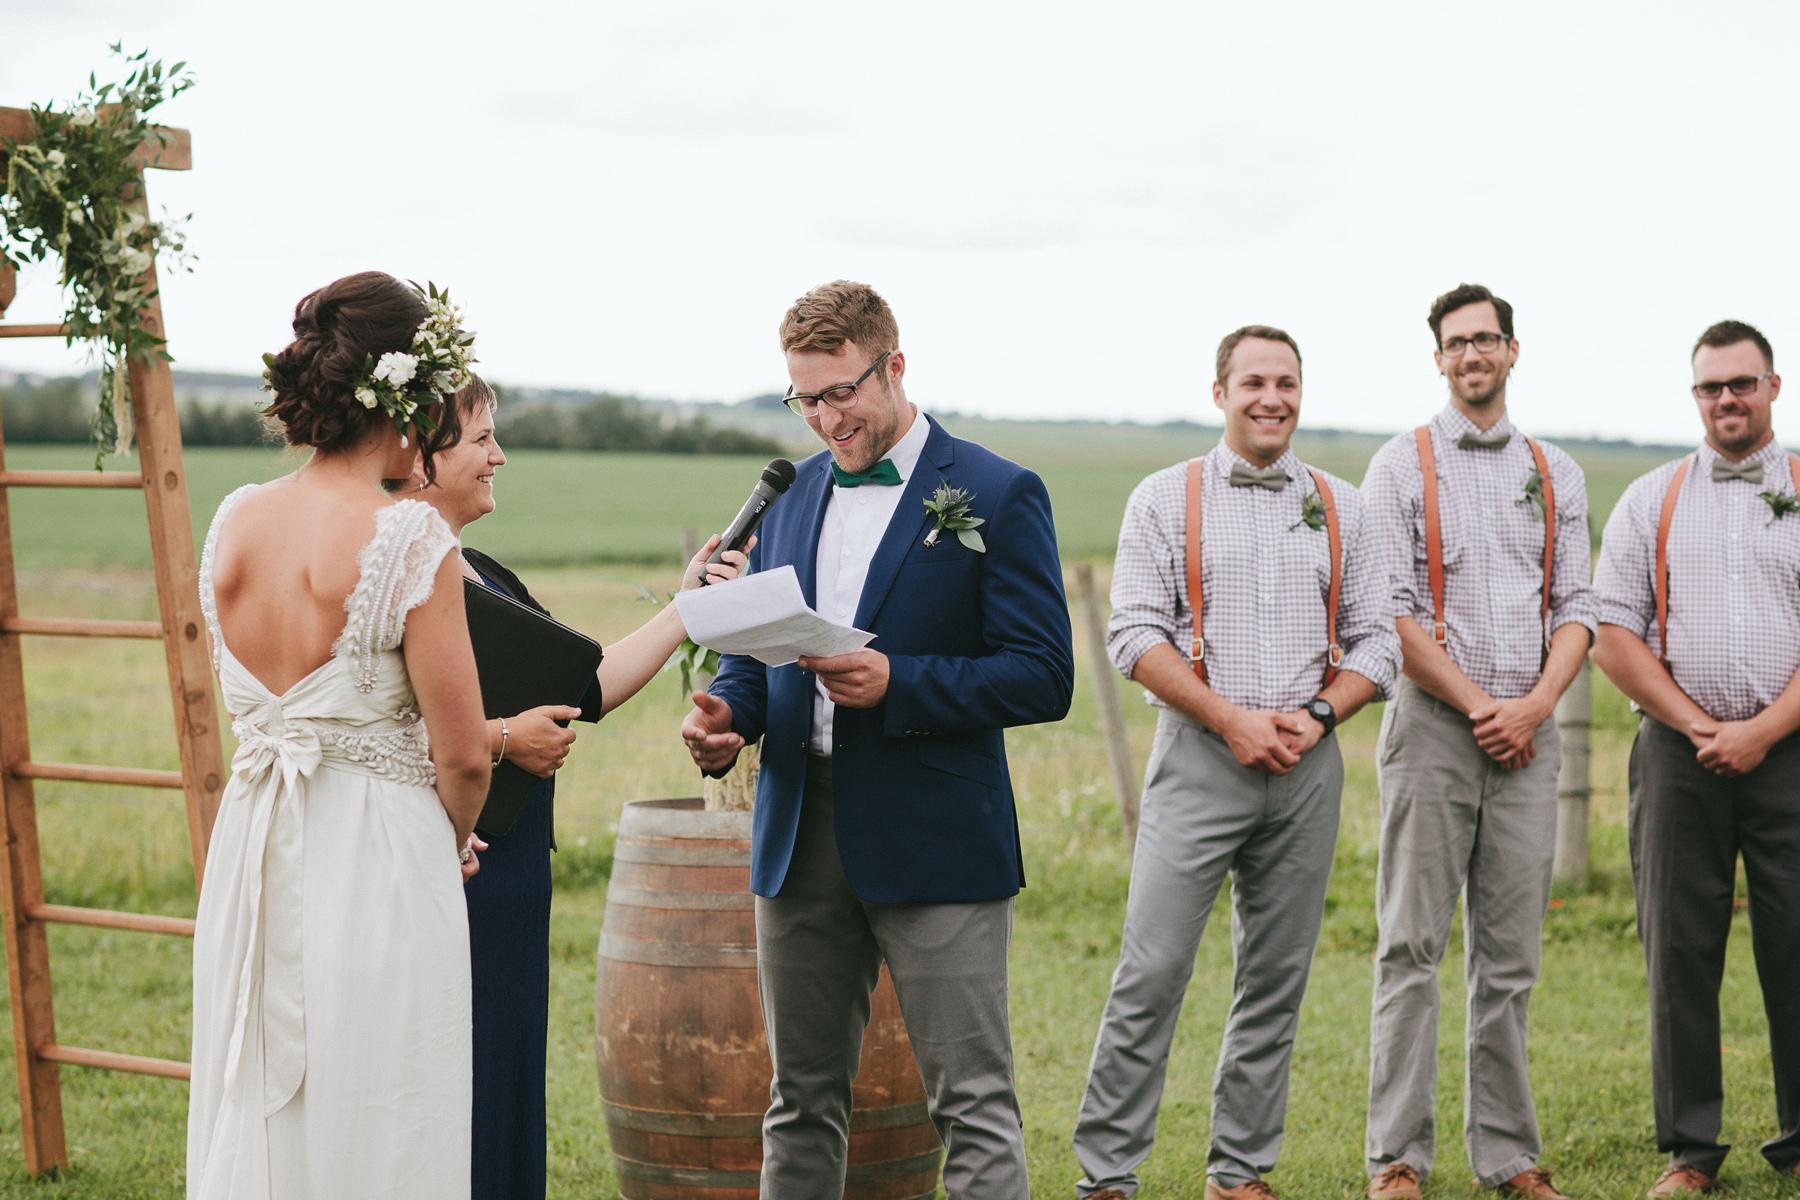 alberta-farm-wedding-photographer-rp-wj-125.jpg